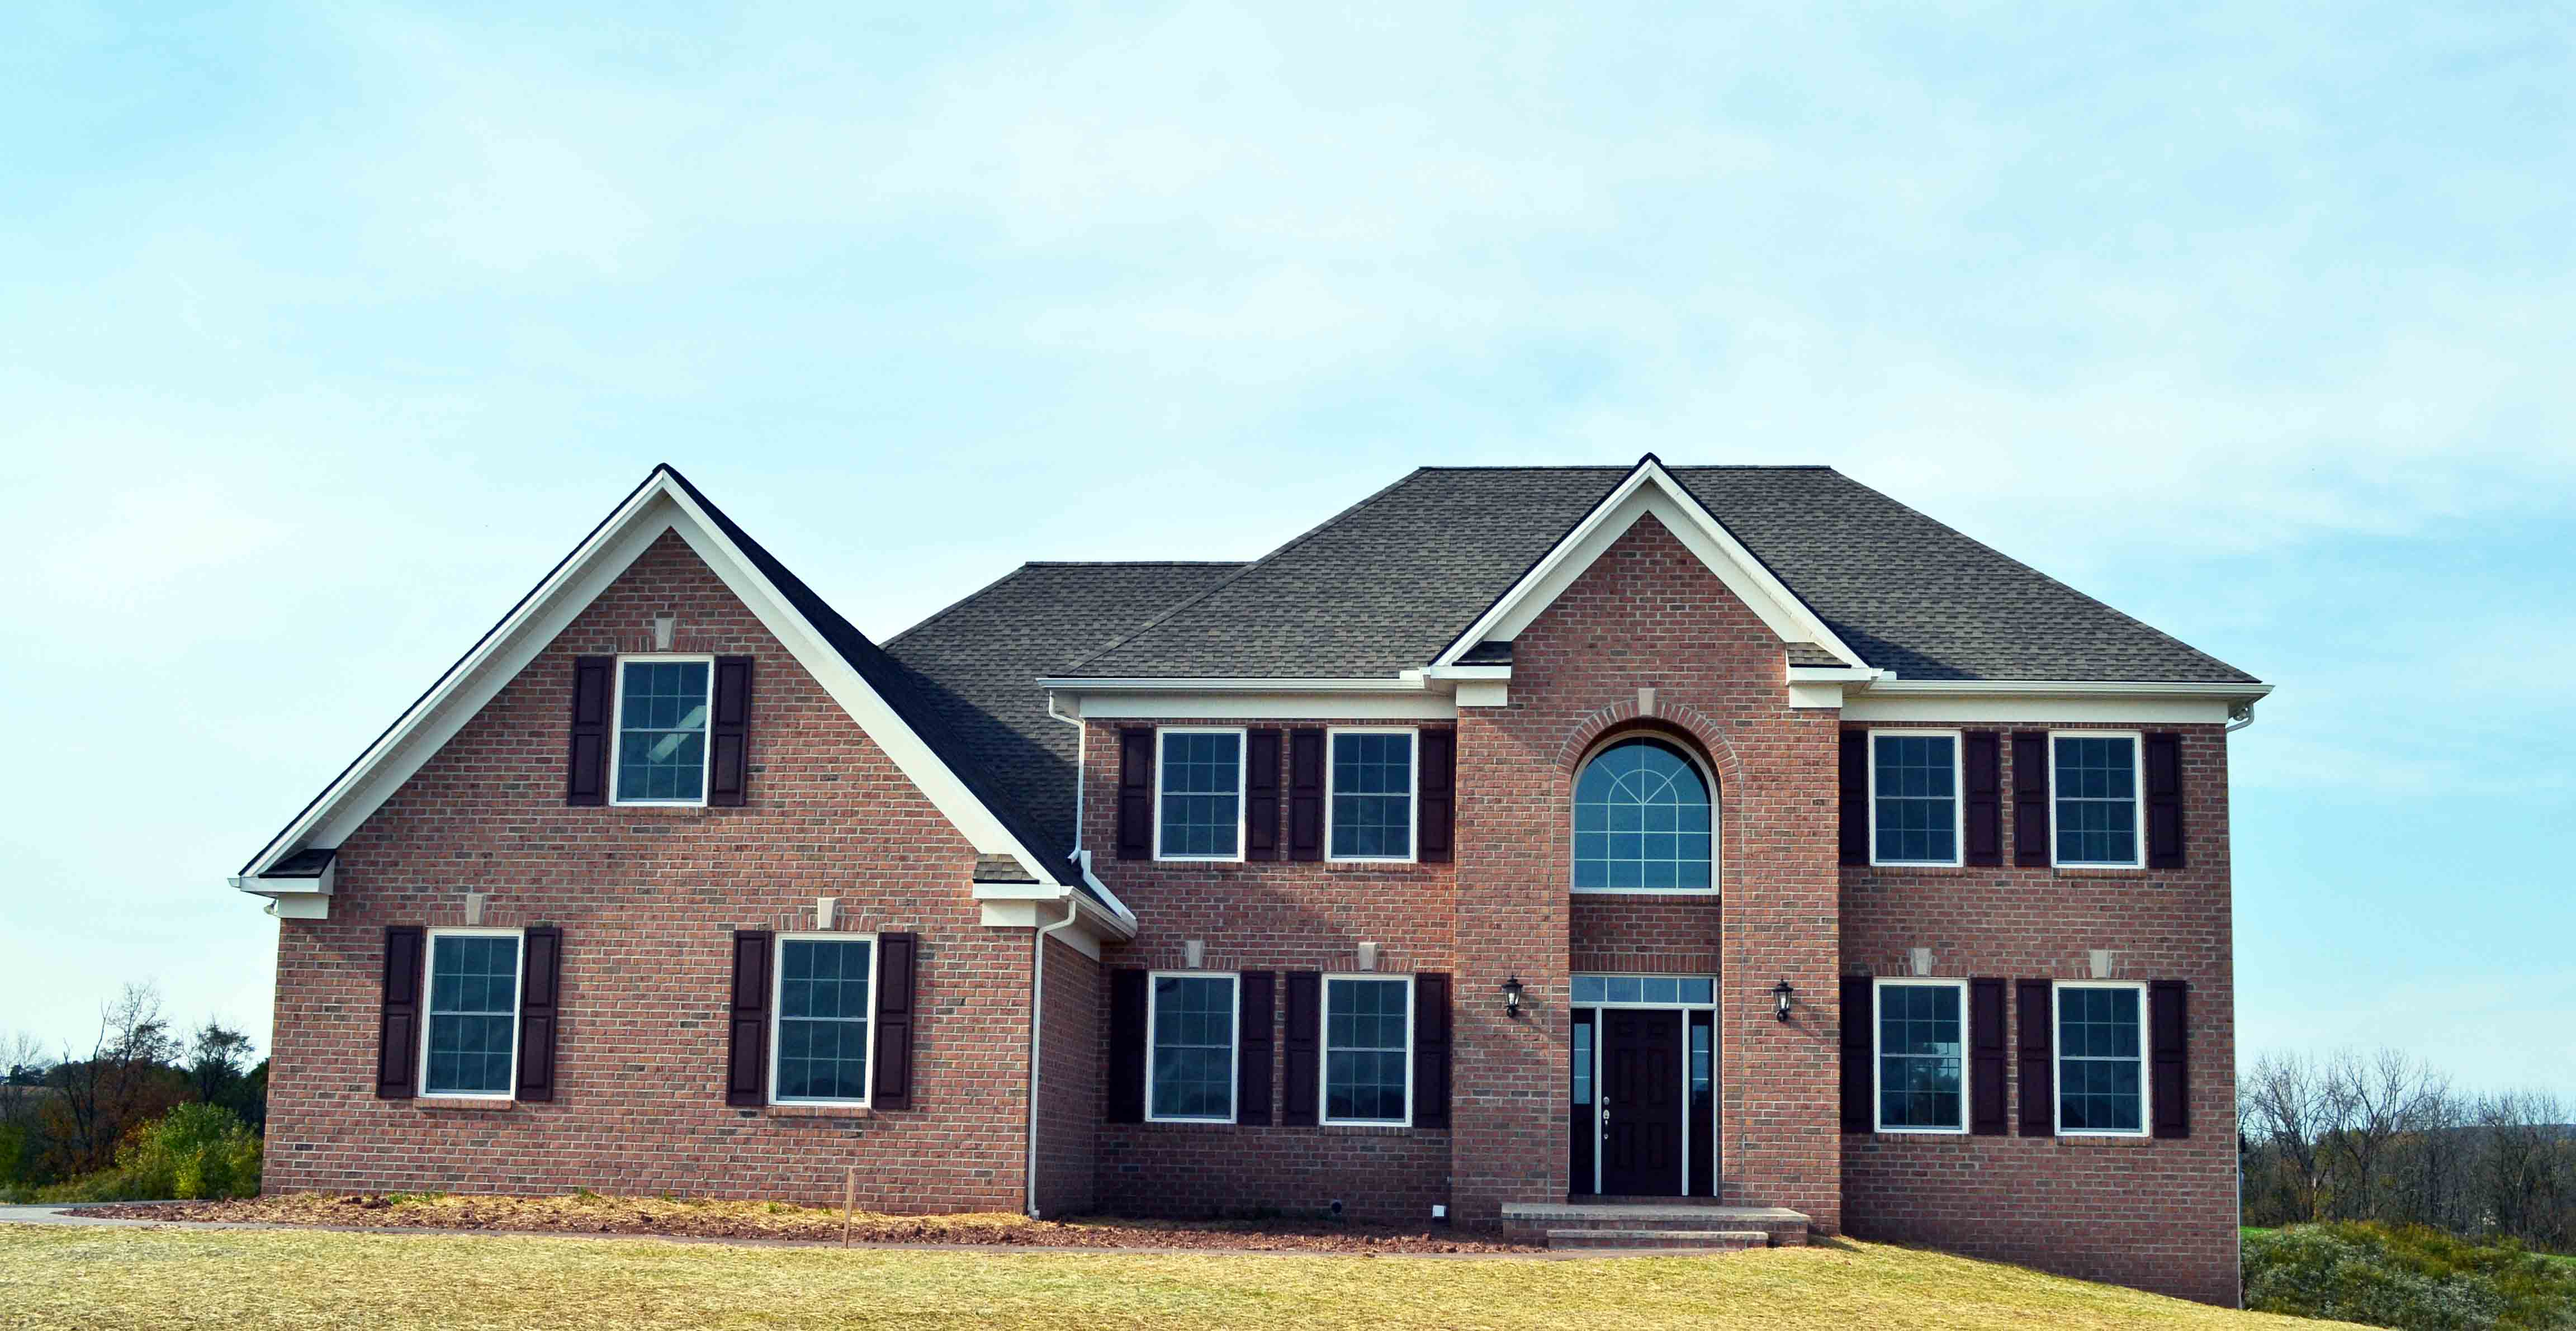 Custom Home Front Elevation : Jlh inc custom home jeffrey l henry homes